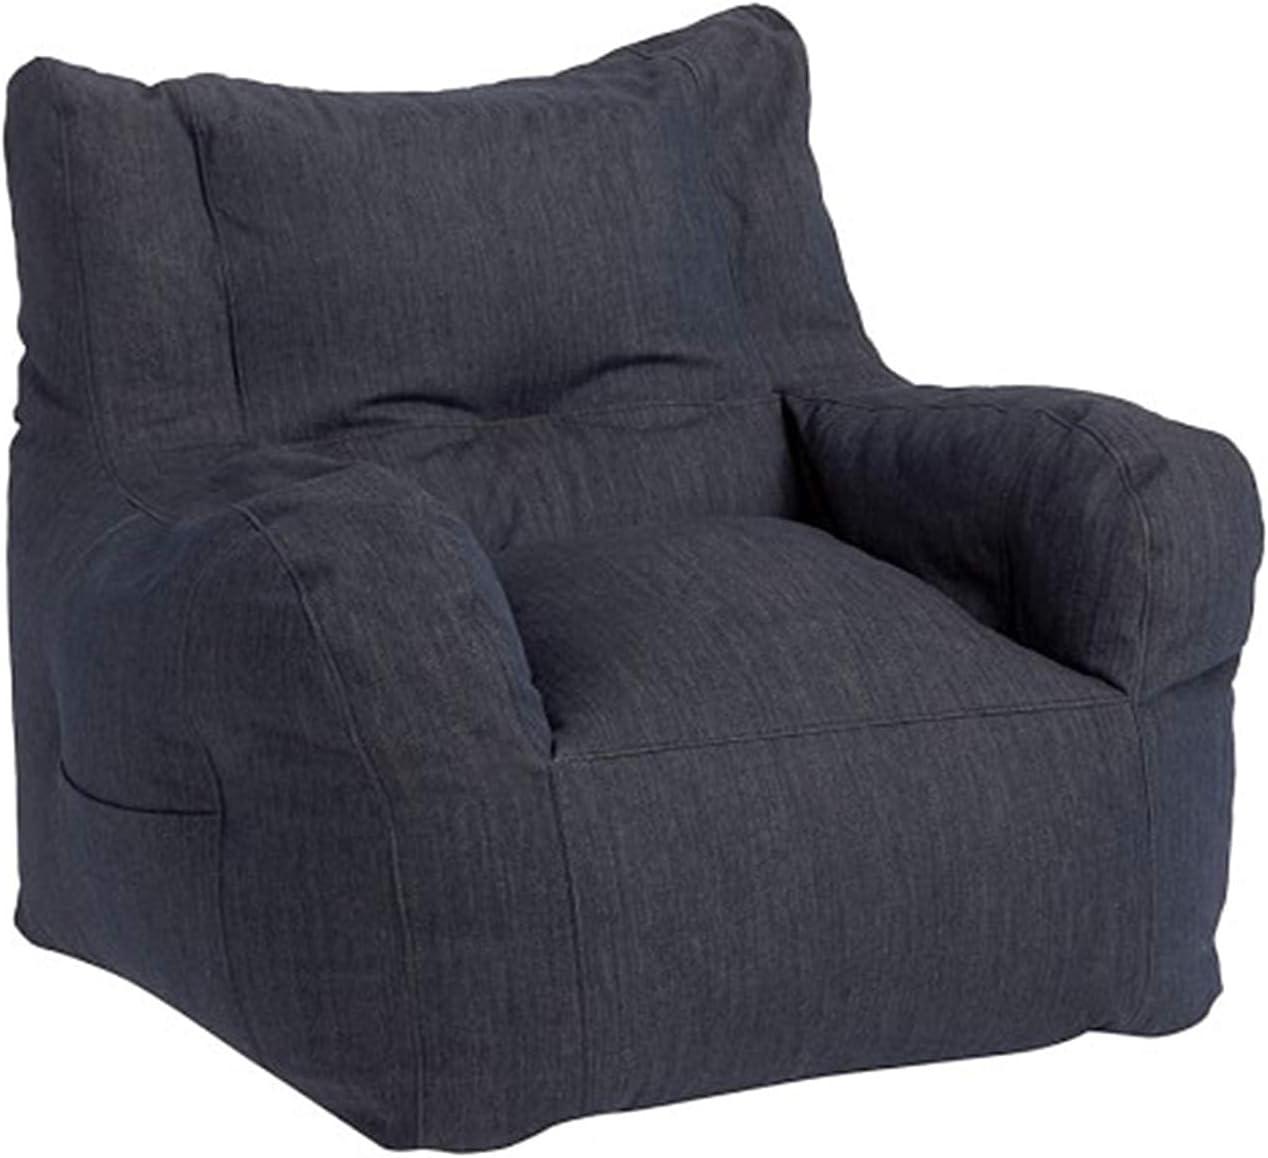 HAOHANYOUPIN Leisure Single Bean Bag Nippon regular agency Filling no discount Chair Fabric